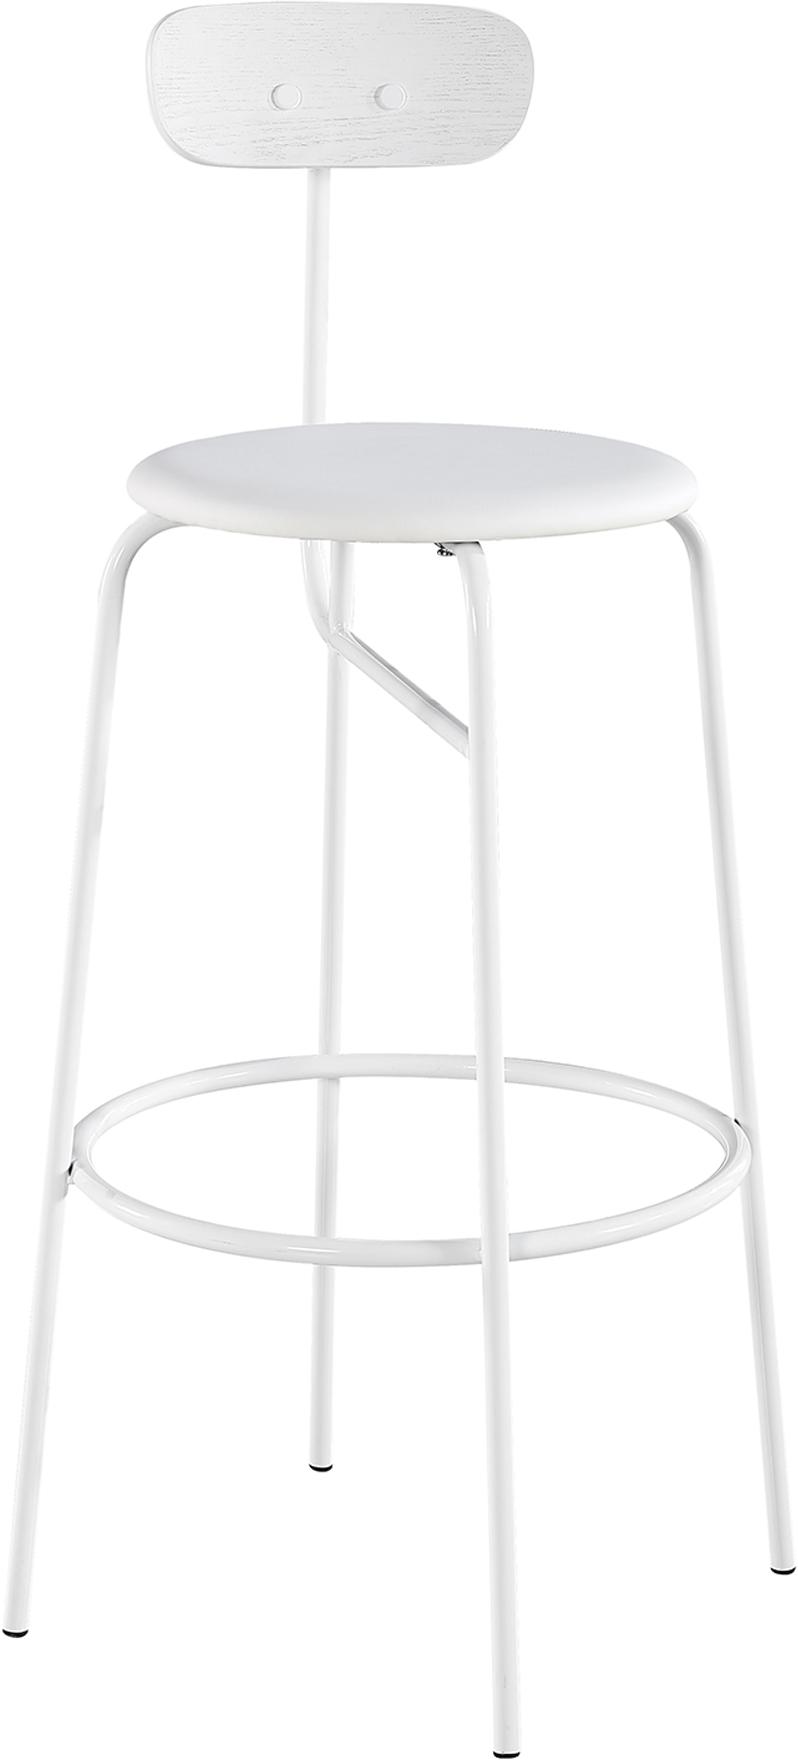 Coda bar stool